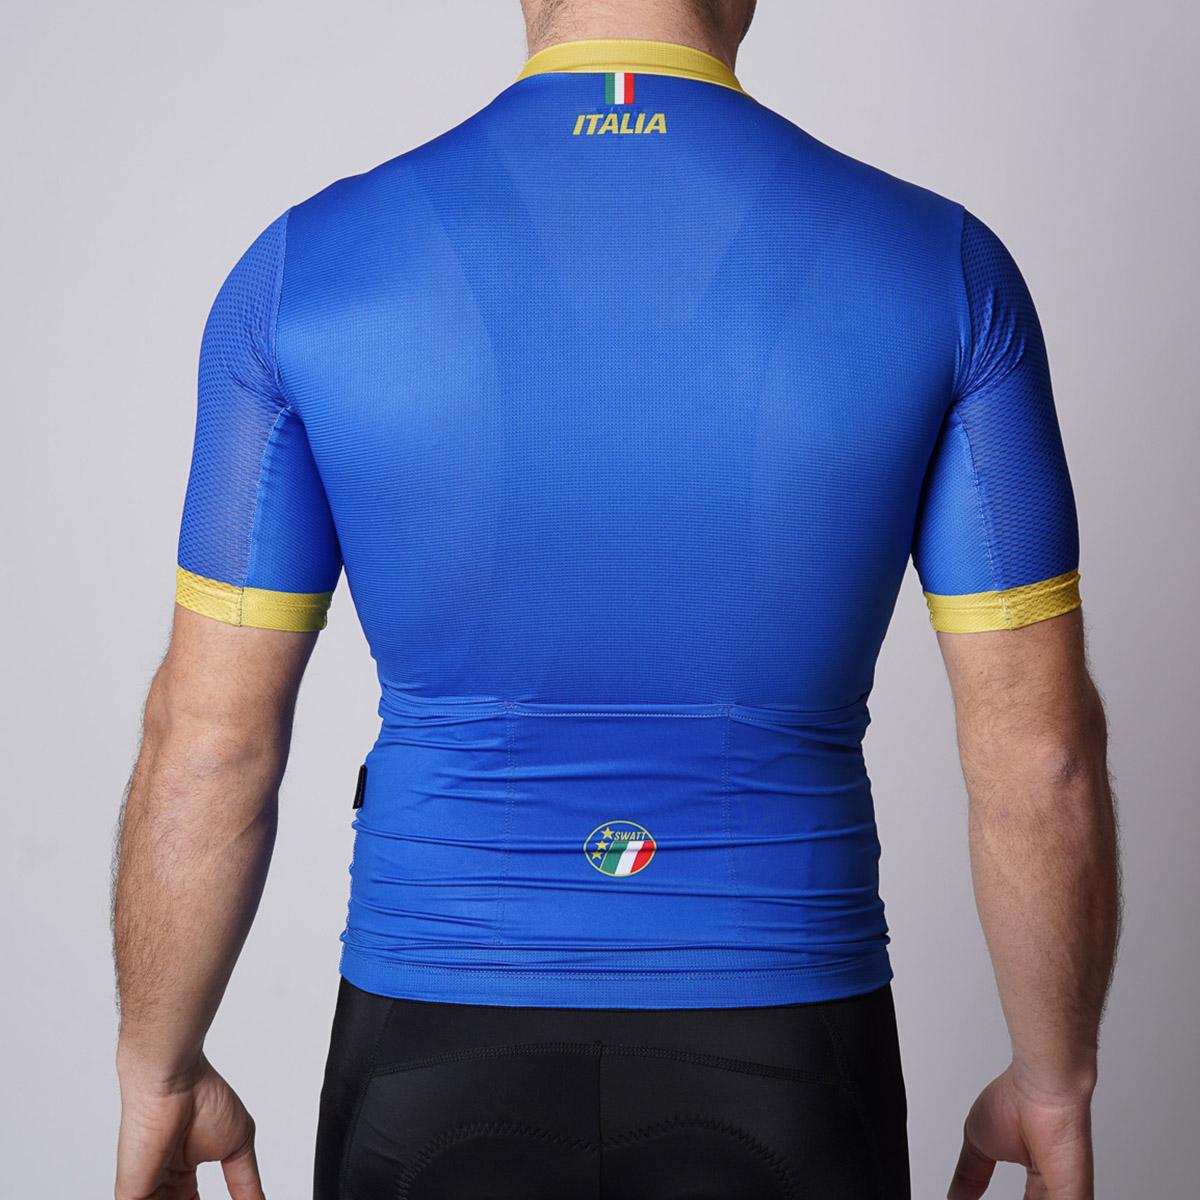 italia cycling jersey swatt club